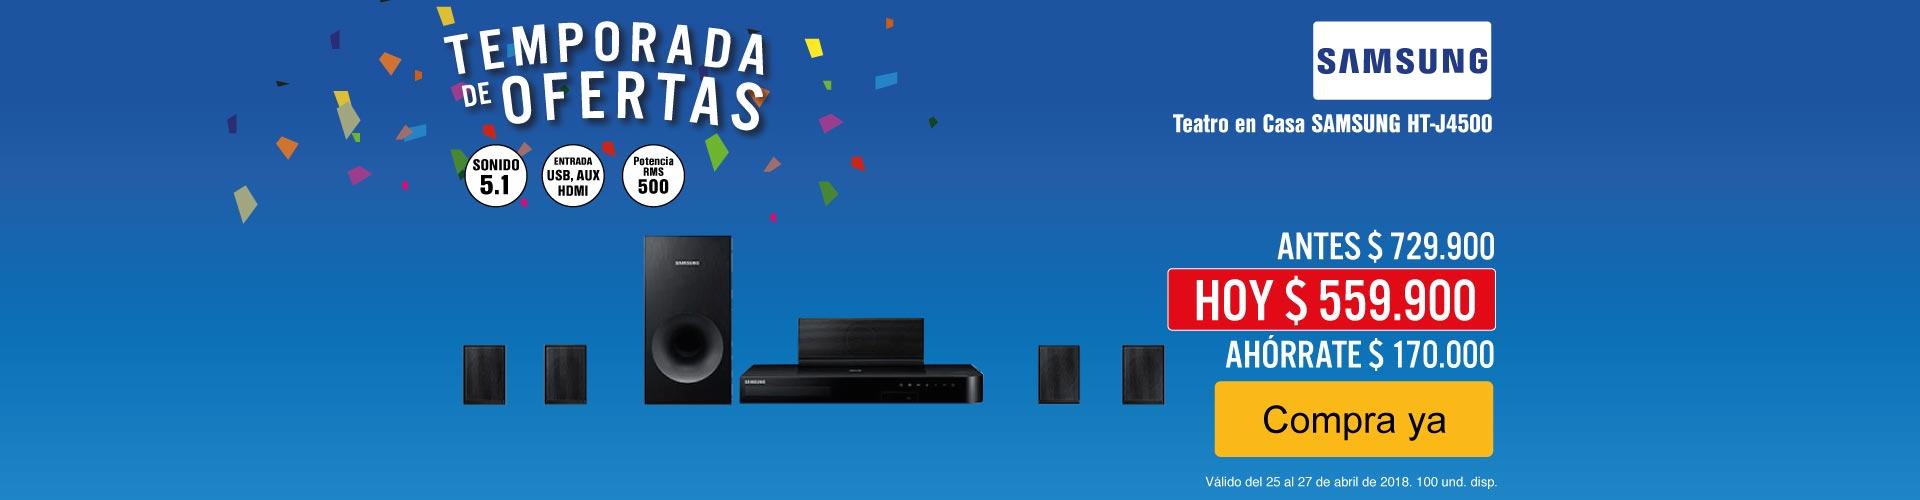 KT-PPAL-4-audio-PP---Samsung-HT-J4500-Abr25